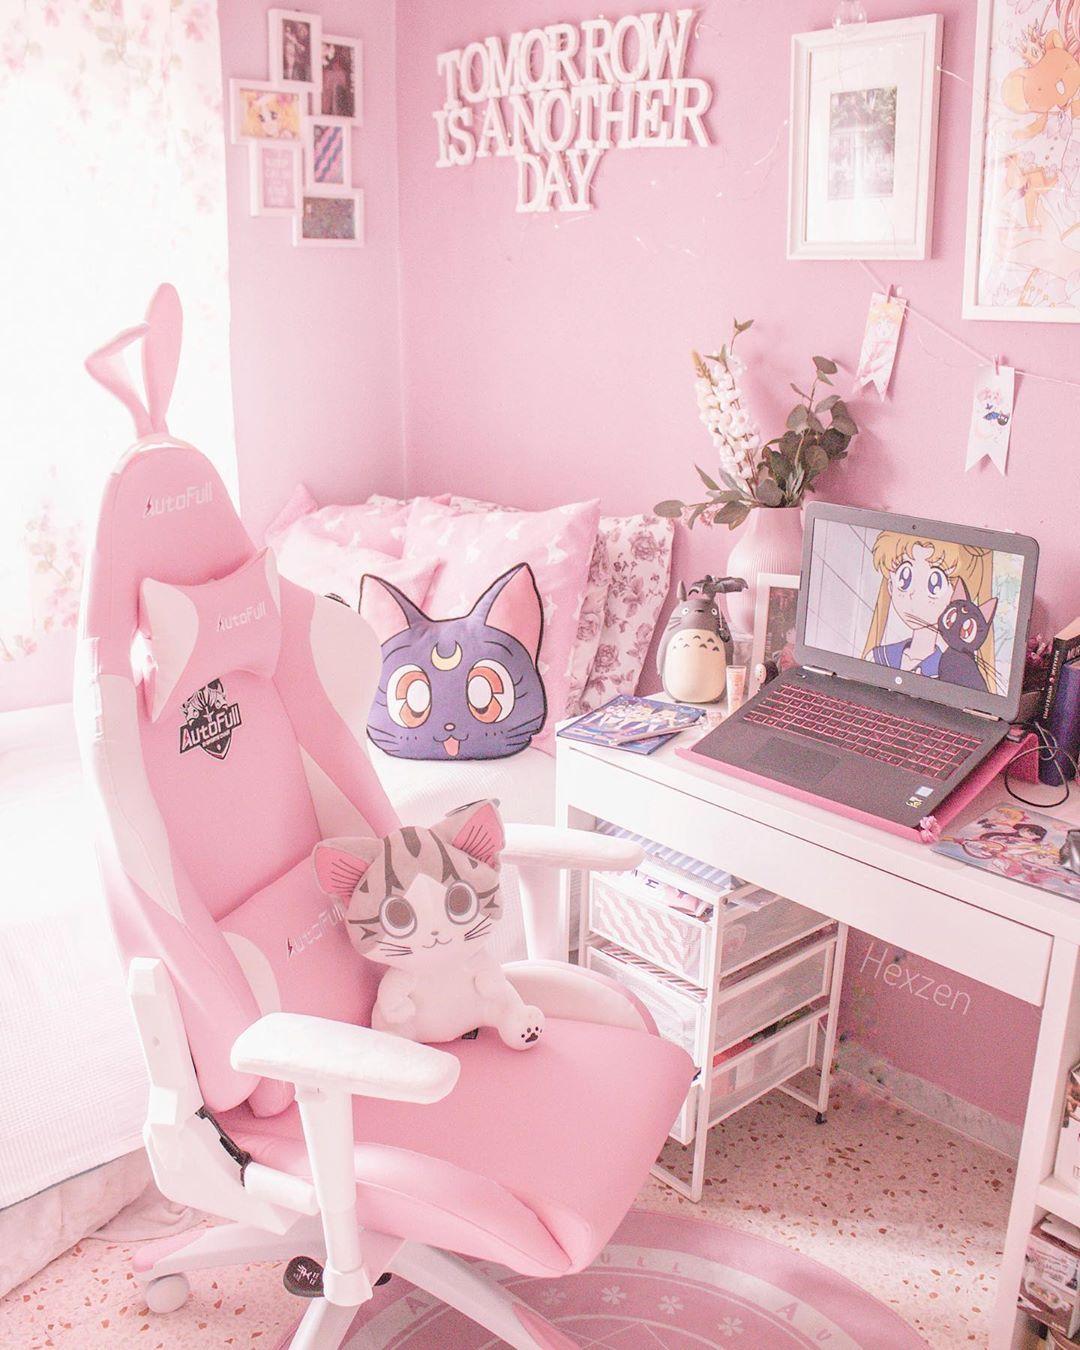 13 9 Mil Curtidas 76 Comentarios Valeria Kawaii Addicted Hexzen No Instagram Luna Or Chi E Adesso Io Dove In 2020 Gamer Room Otaku Room Cute Room Ideas